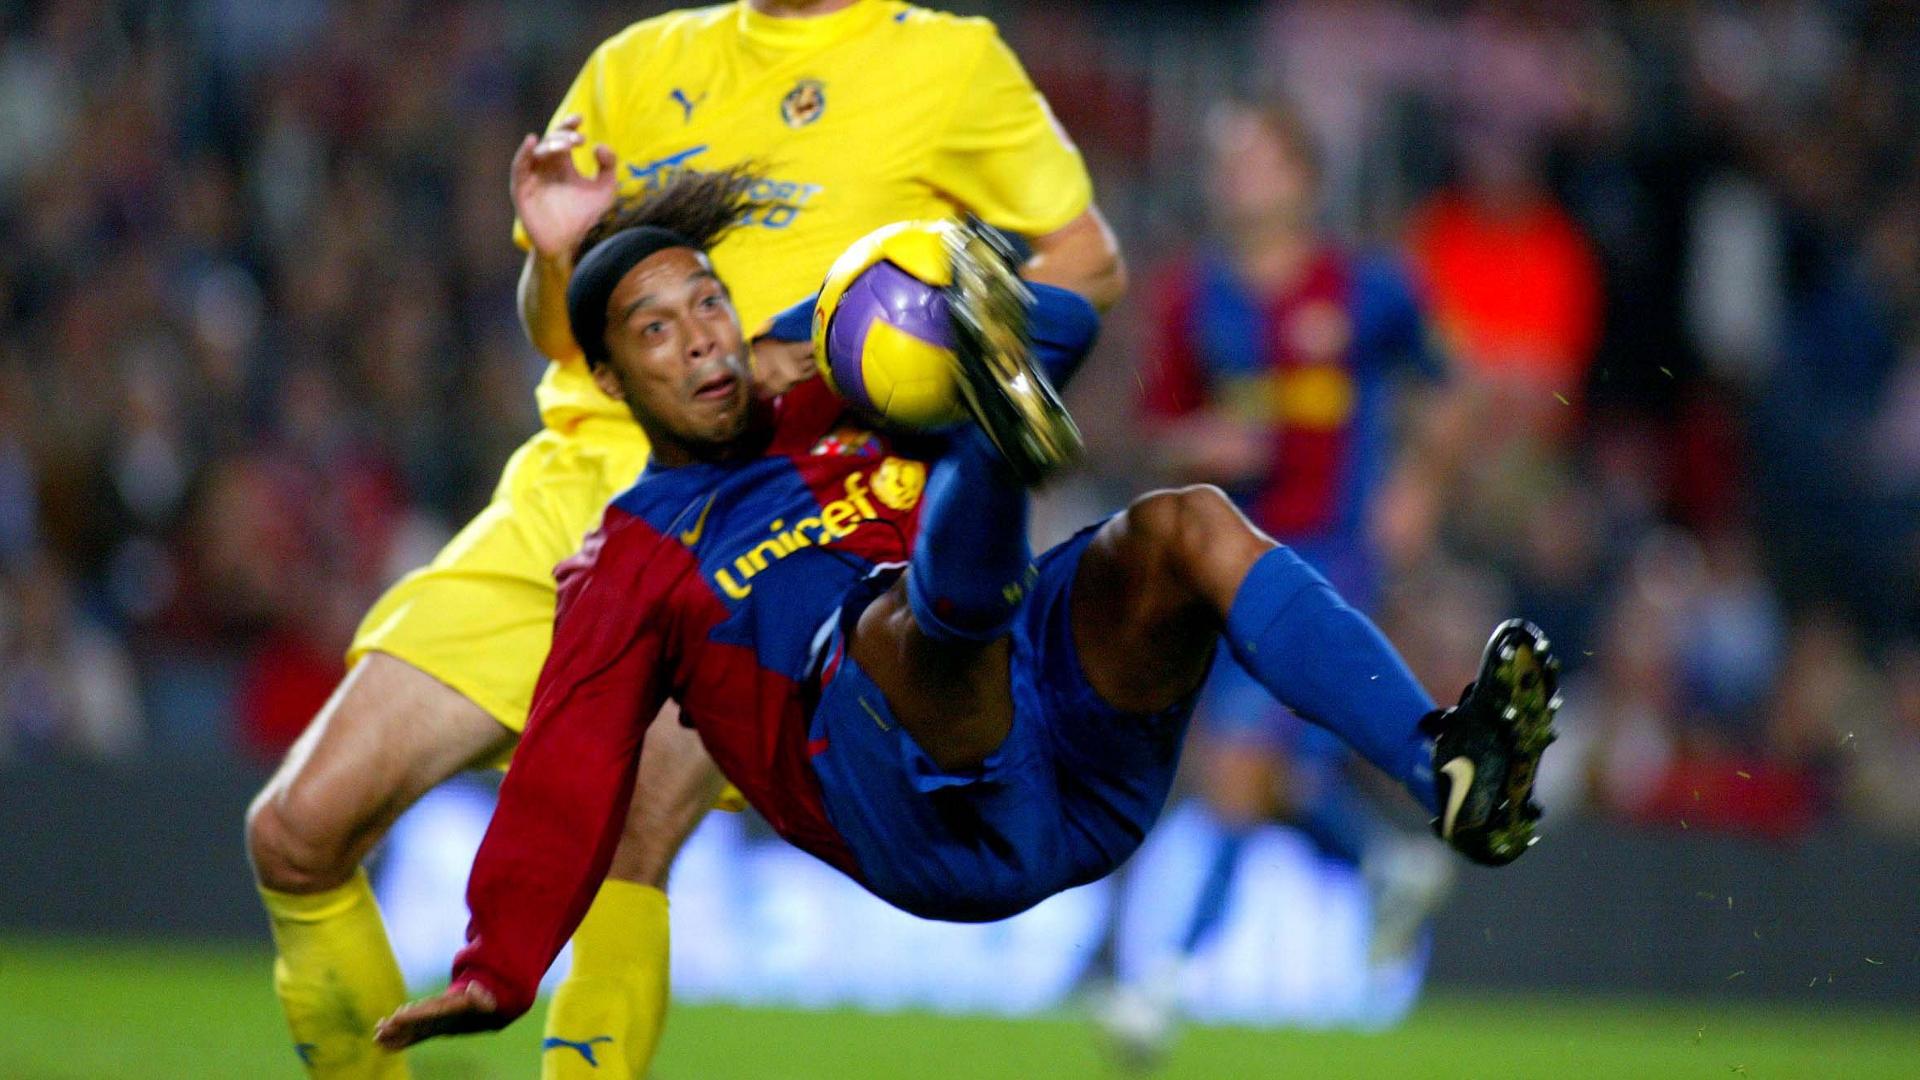 Messi or Ronaldo? Ronaldinho was more talented than both